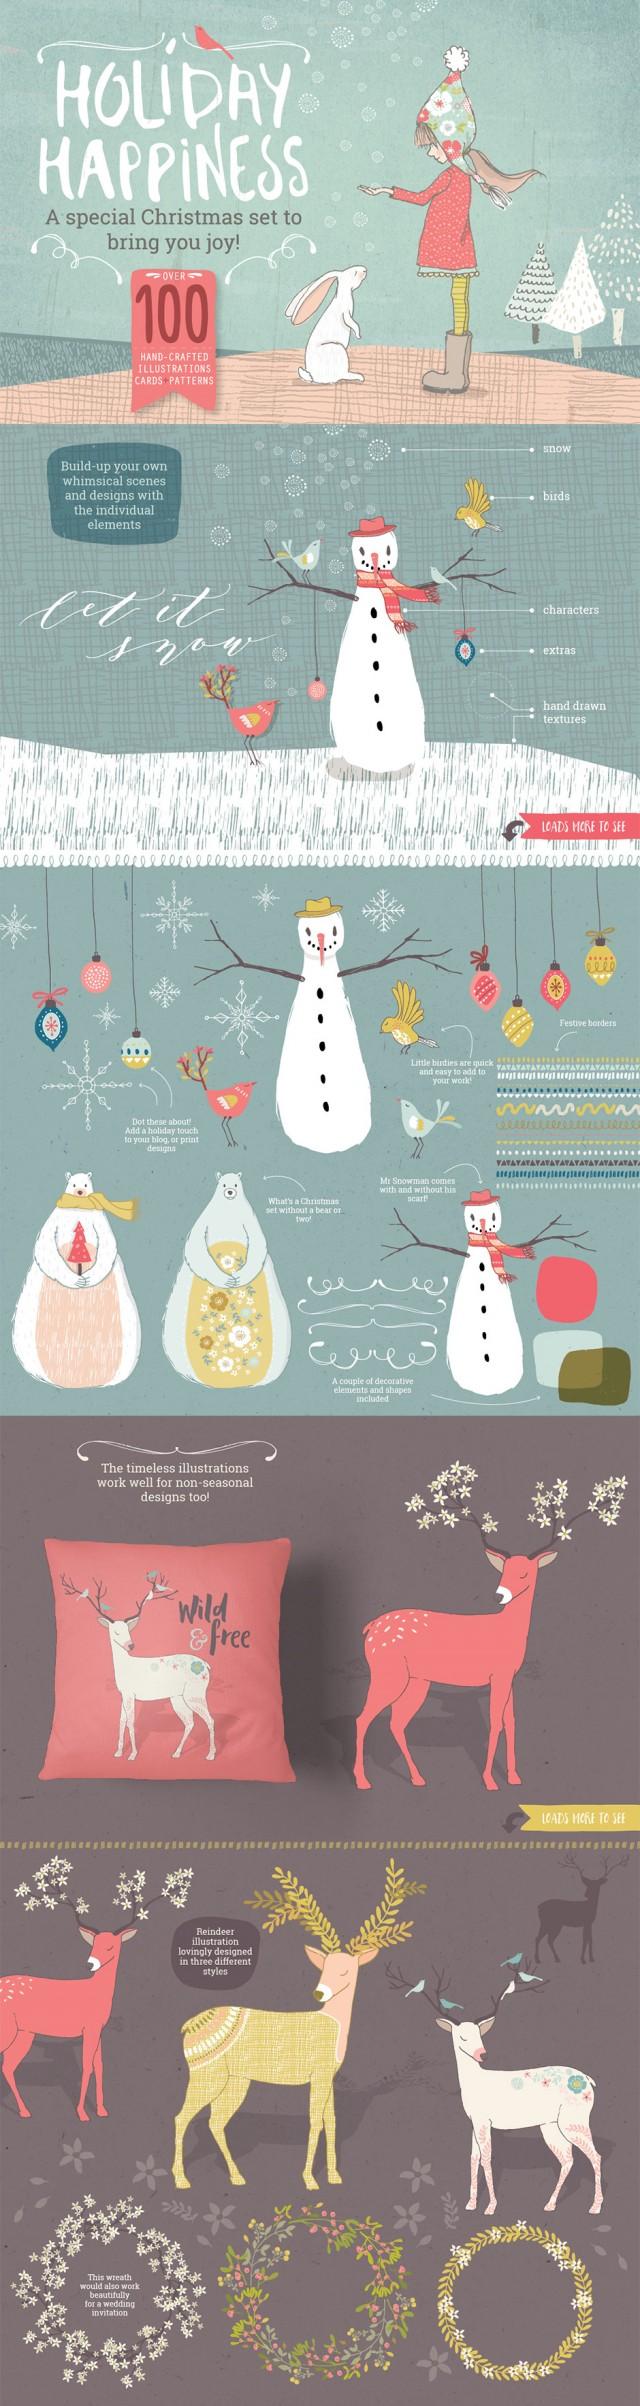 november-vectors-2016-fall-holiday-illustration-design-bundle